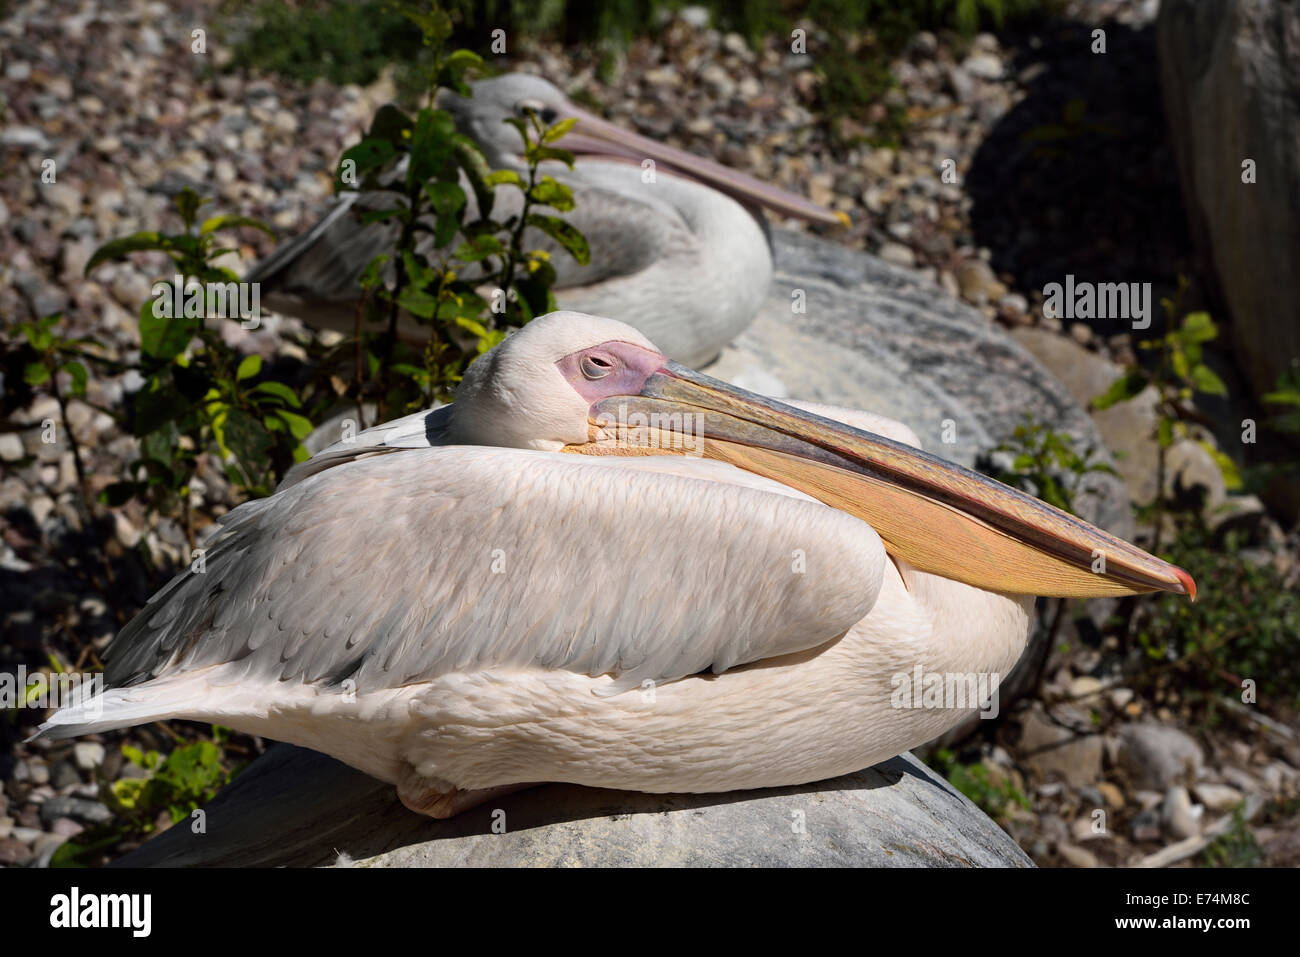 Dozing Great White Pelican Pelecanus onocrotalus sitting on a rock Toronto Zoo - Stock Image